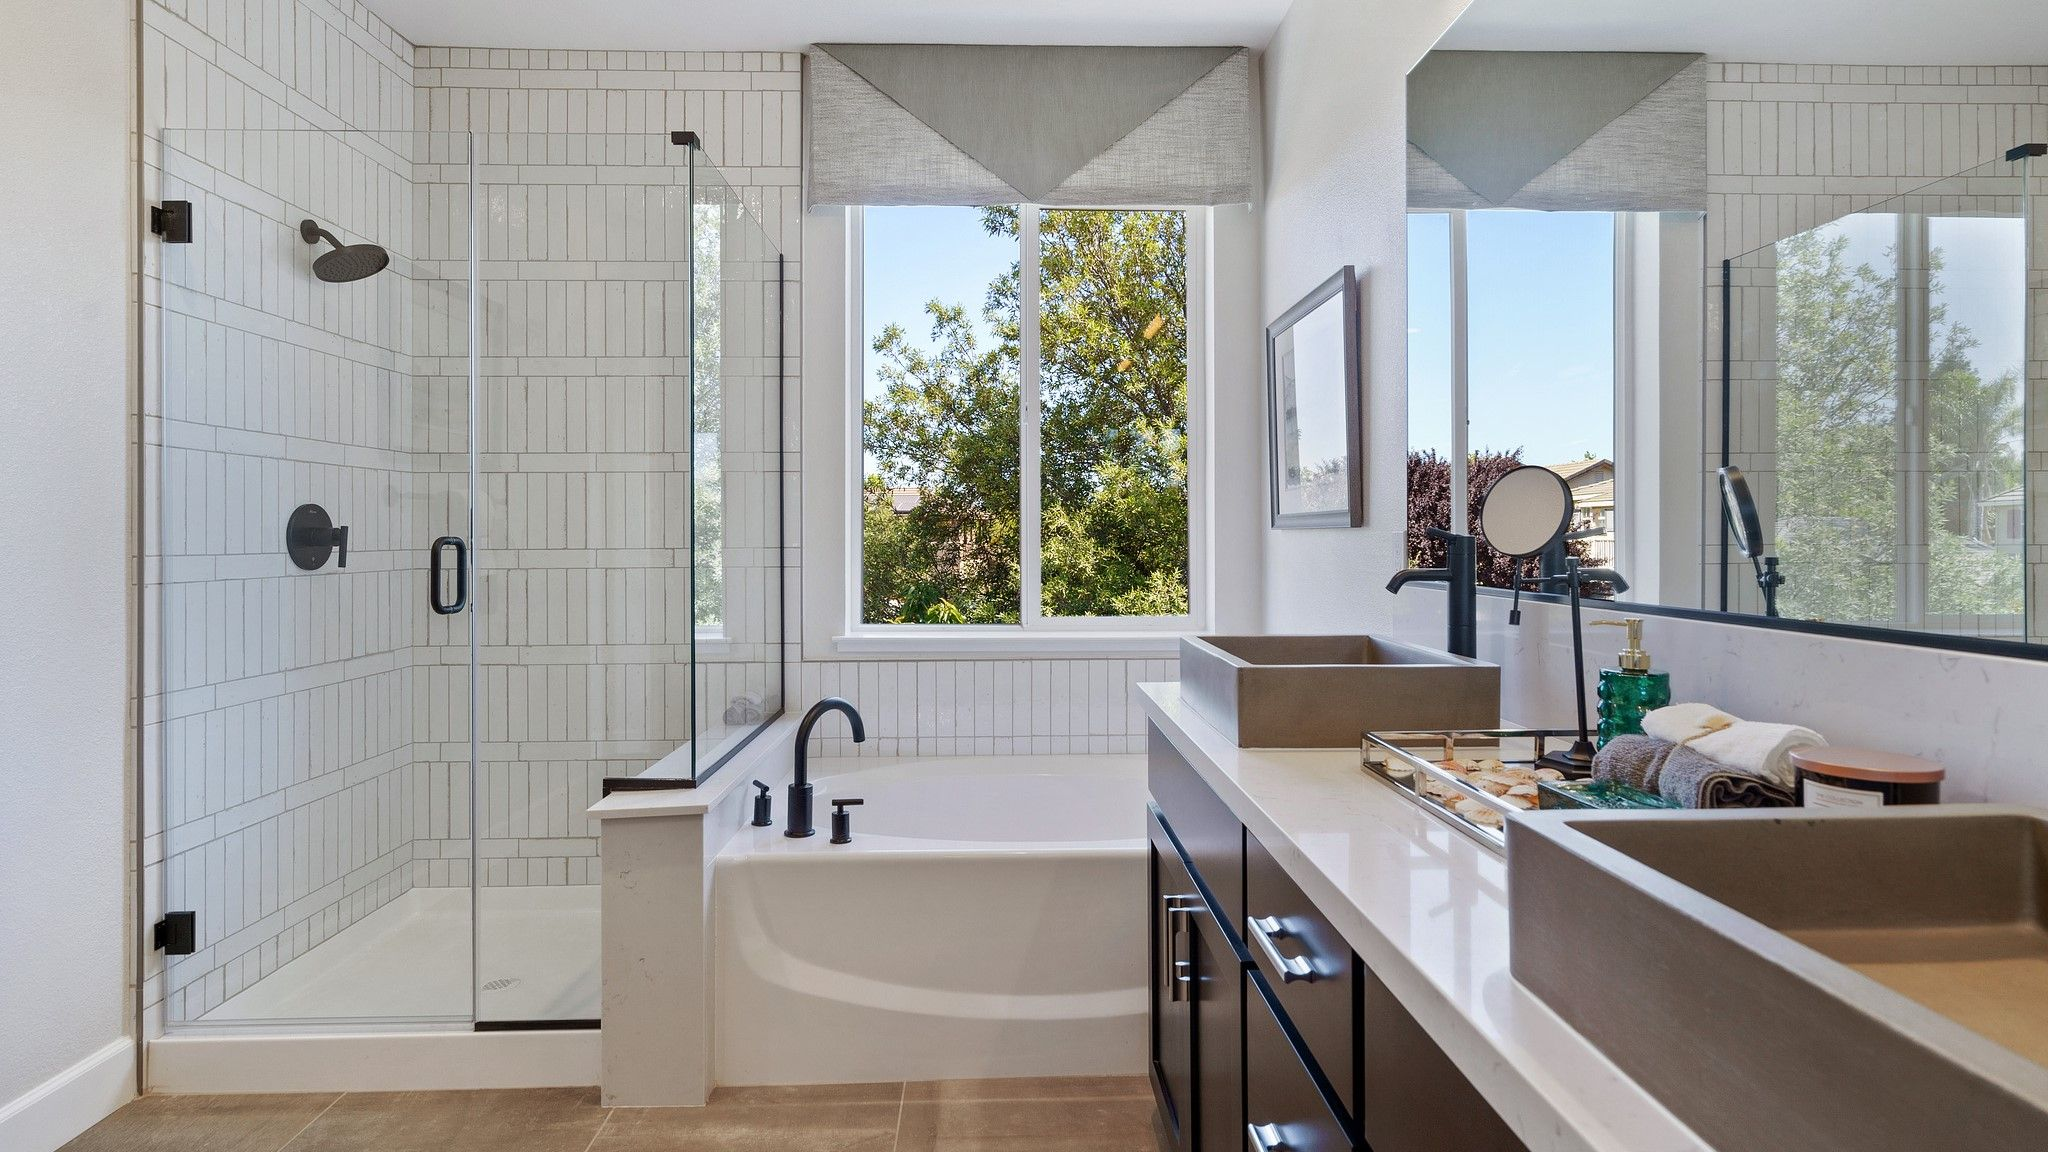 Bathroom featured in the Arroyo By Seeno Homes in Sacramento, CA